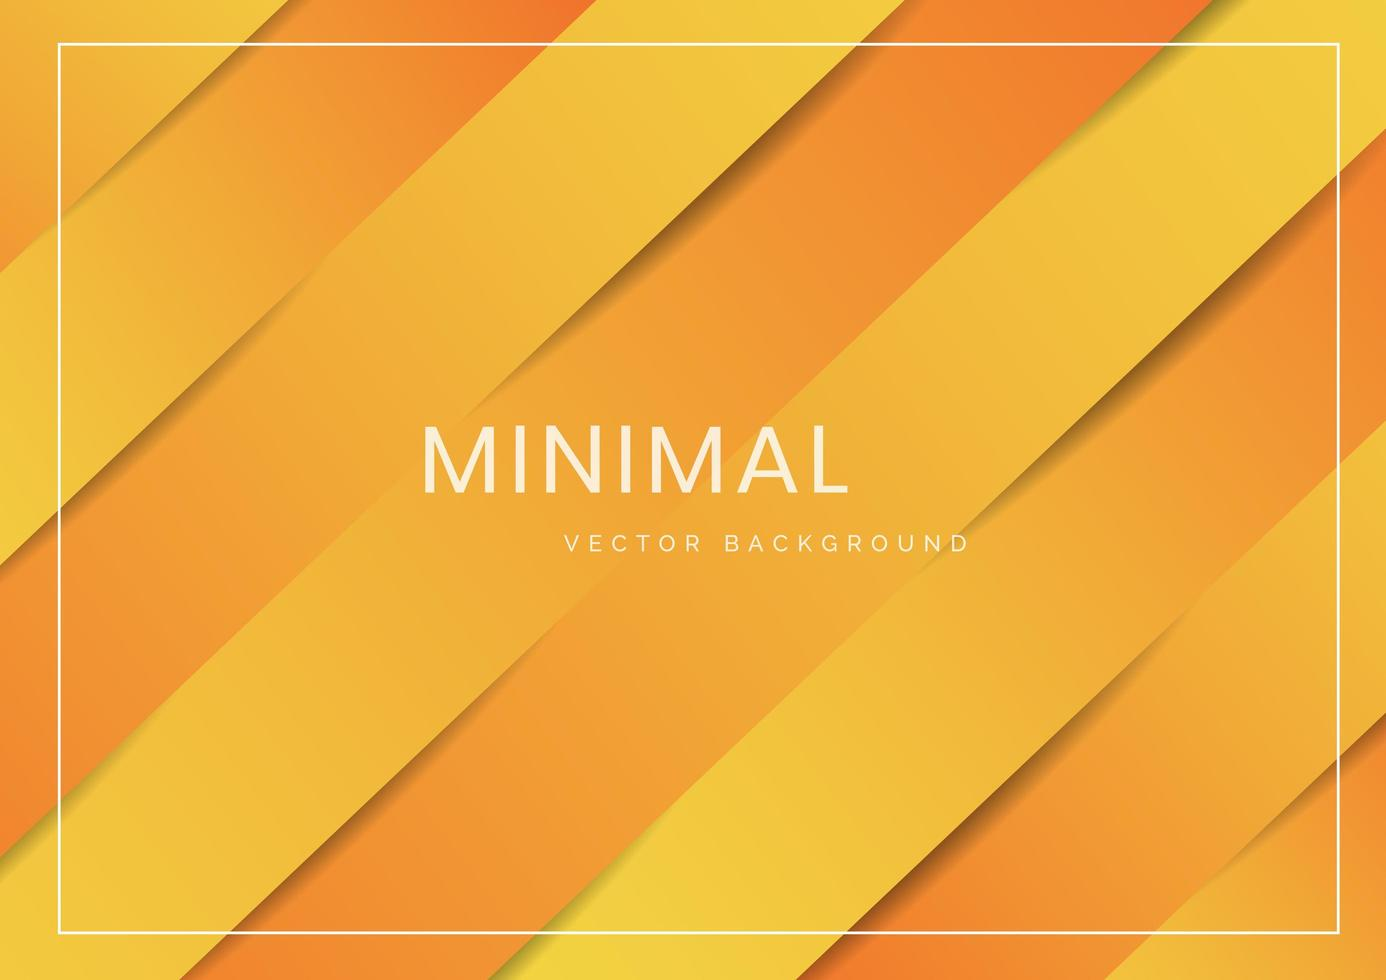 Fondo abstracto, moderno, diagonal amarillo y naranja vector